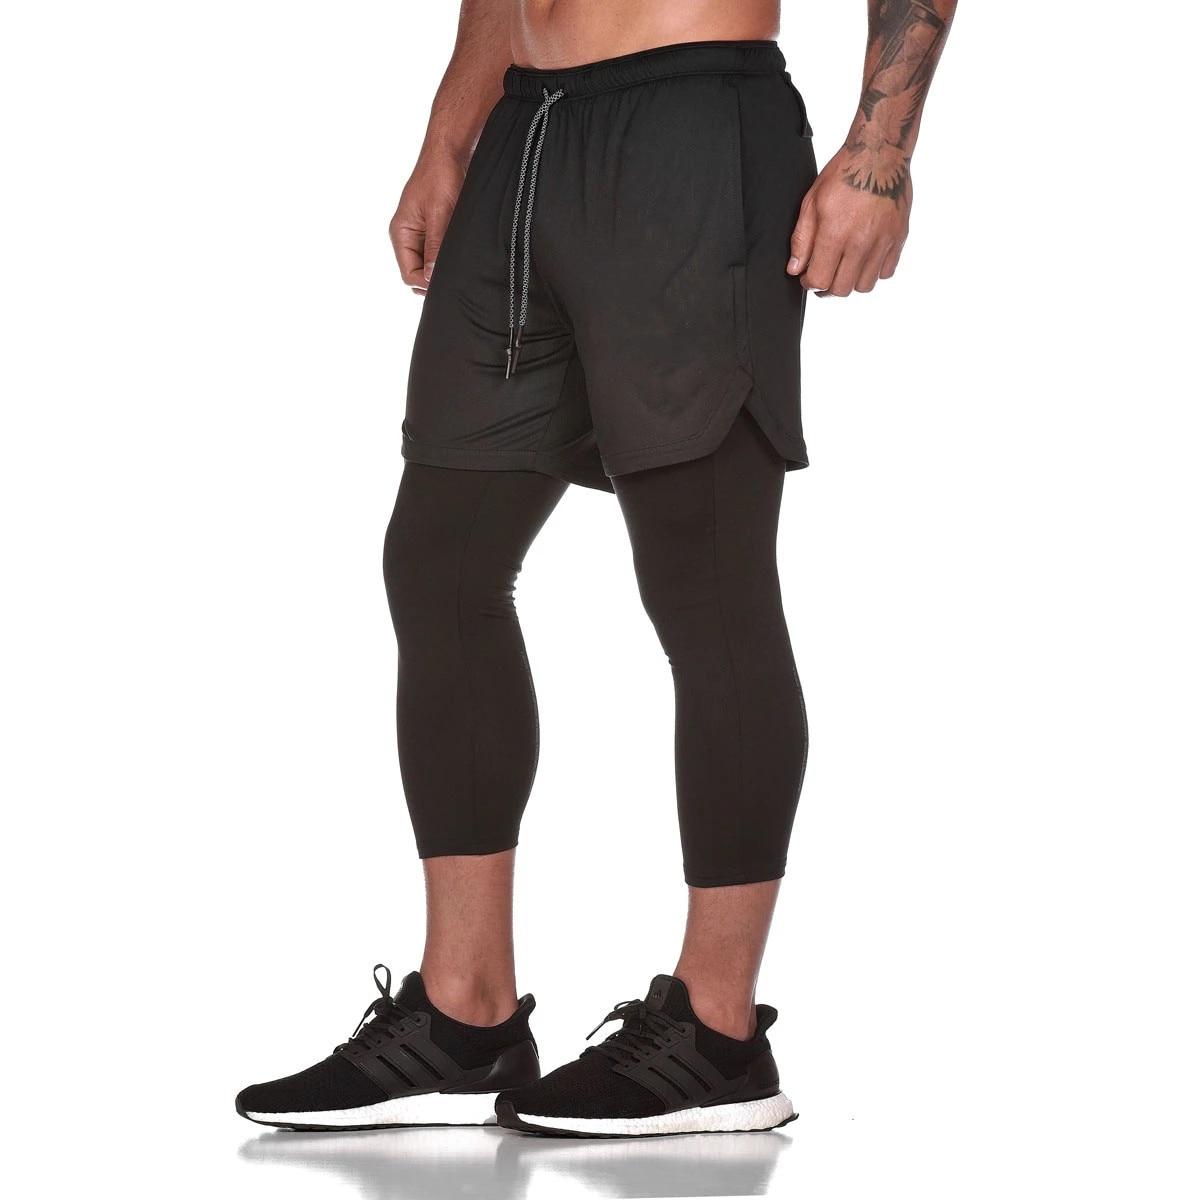 Men Legging Pants 2 In 1 Legging  Mens Joggers Pants Basketball Ankle-Length Pants